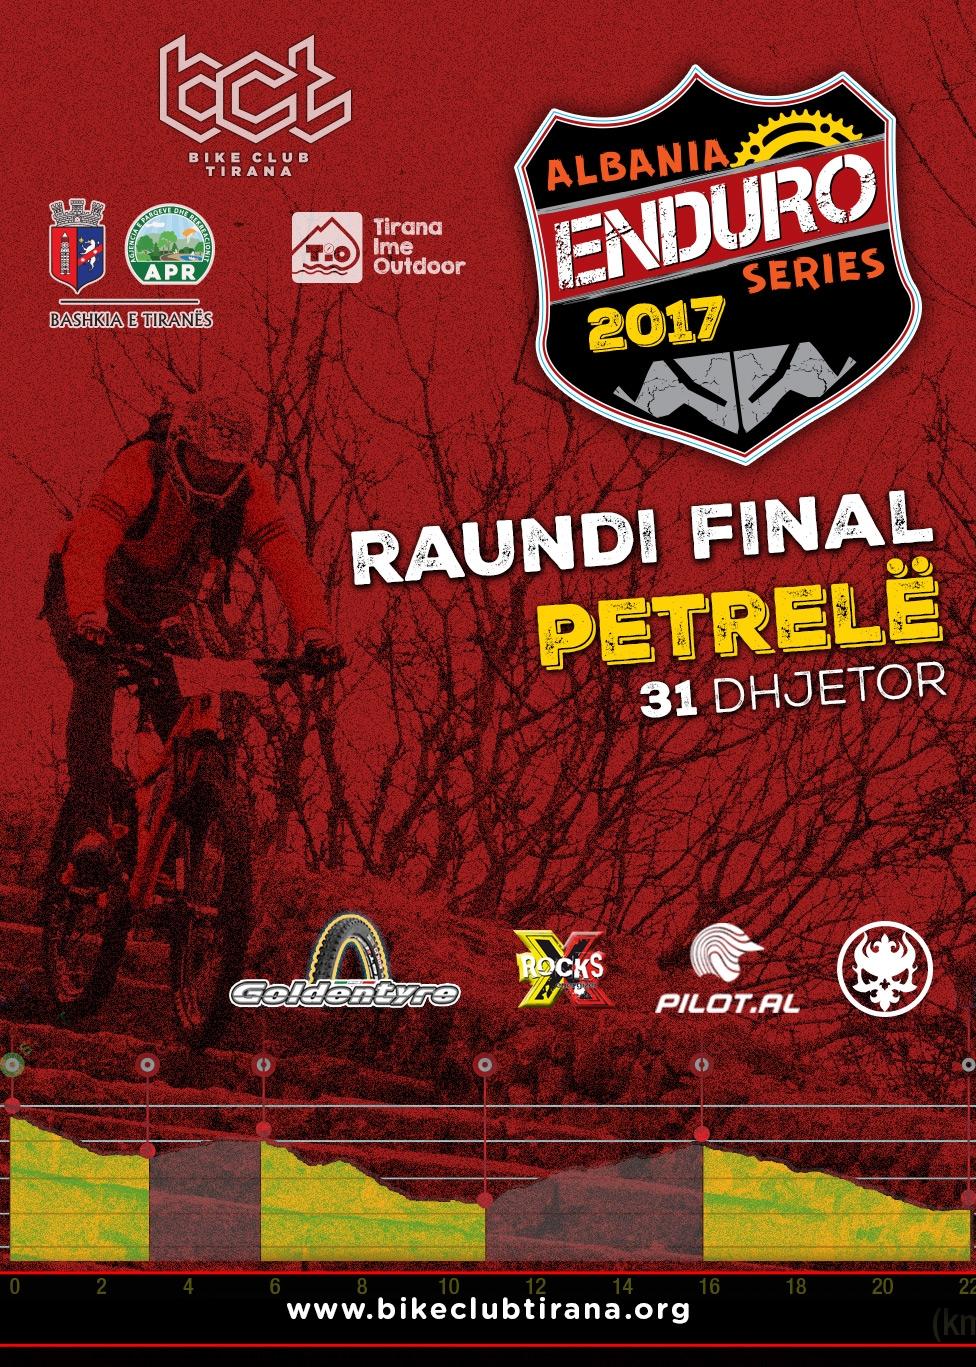 AlbaniaEnduroSeries 2017 Round V